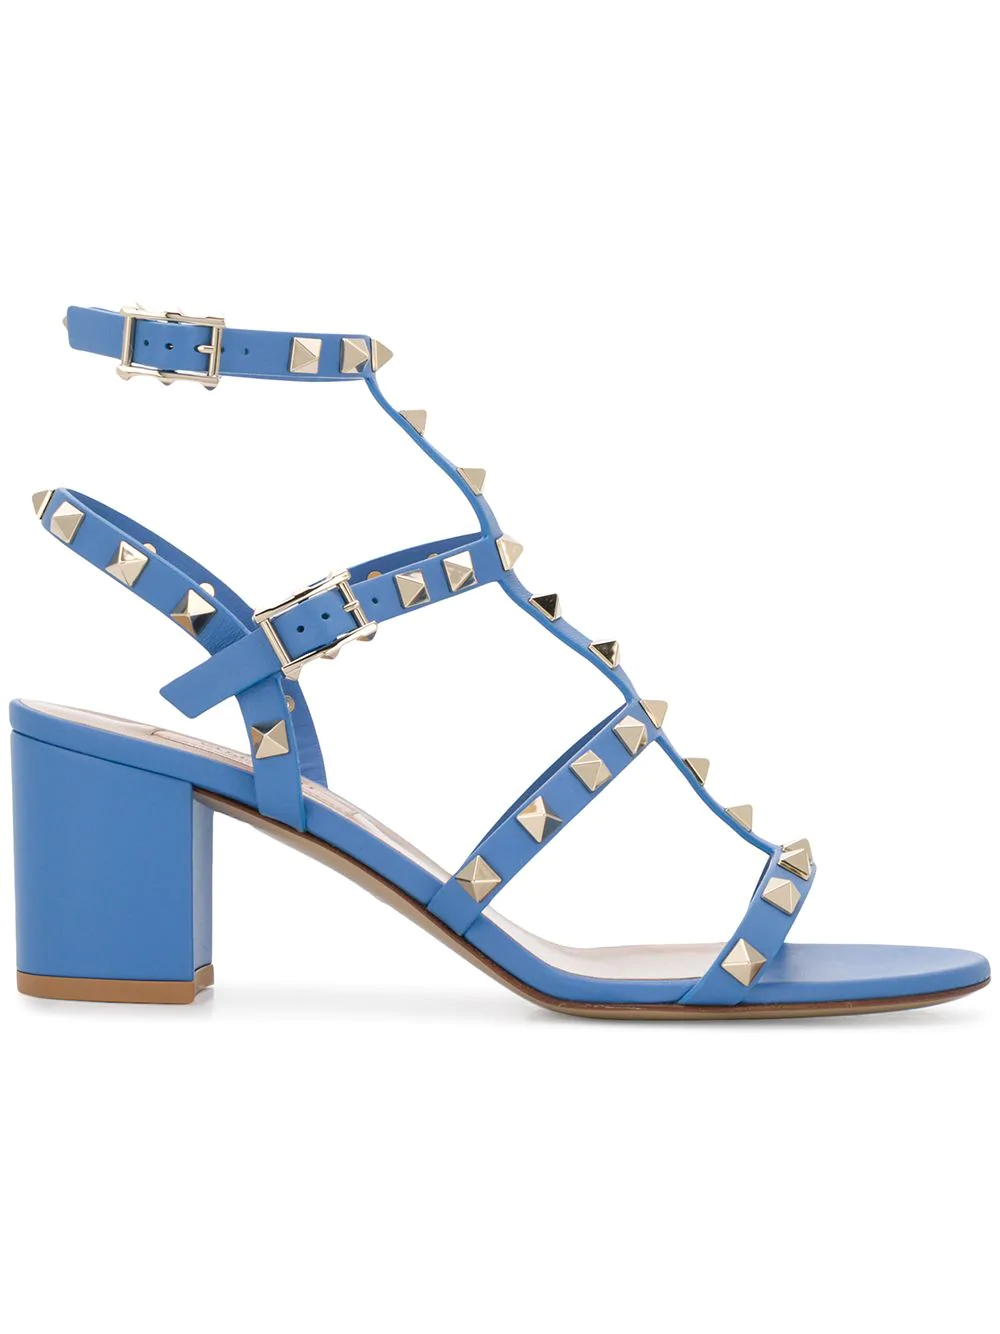 33a0c7276b Valentino Garavani Rockstud Sandals - Blue | ModeSens